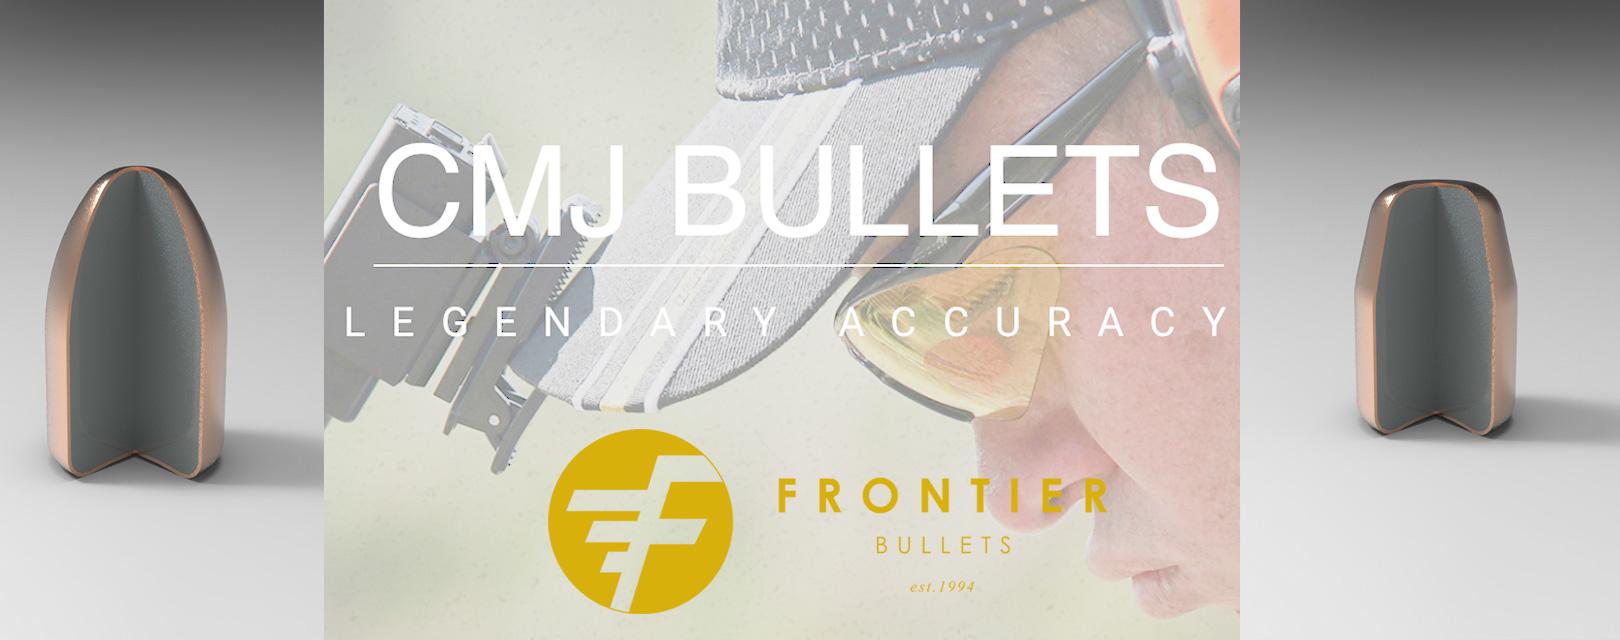 FrontierBullets